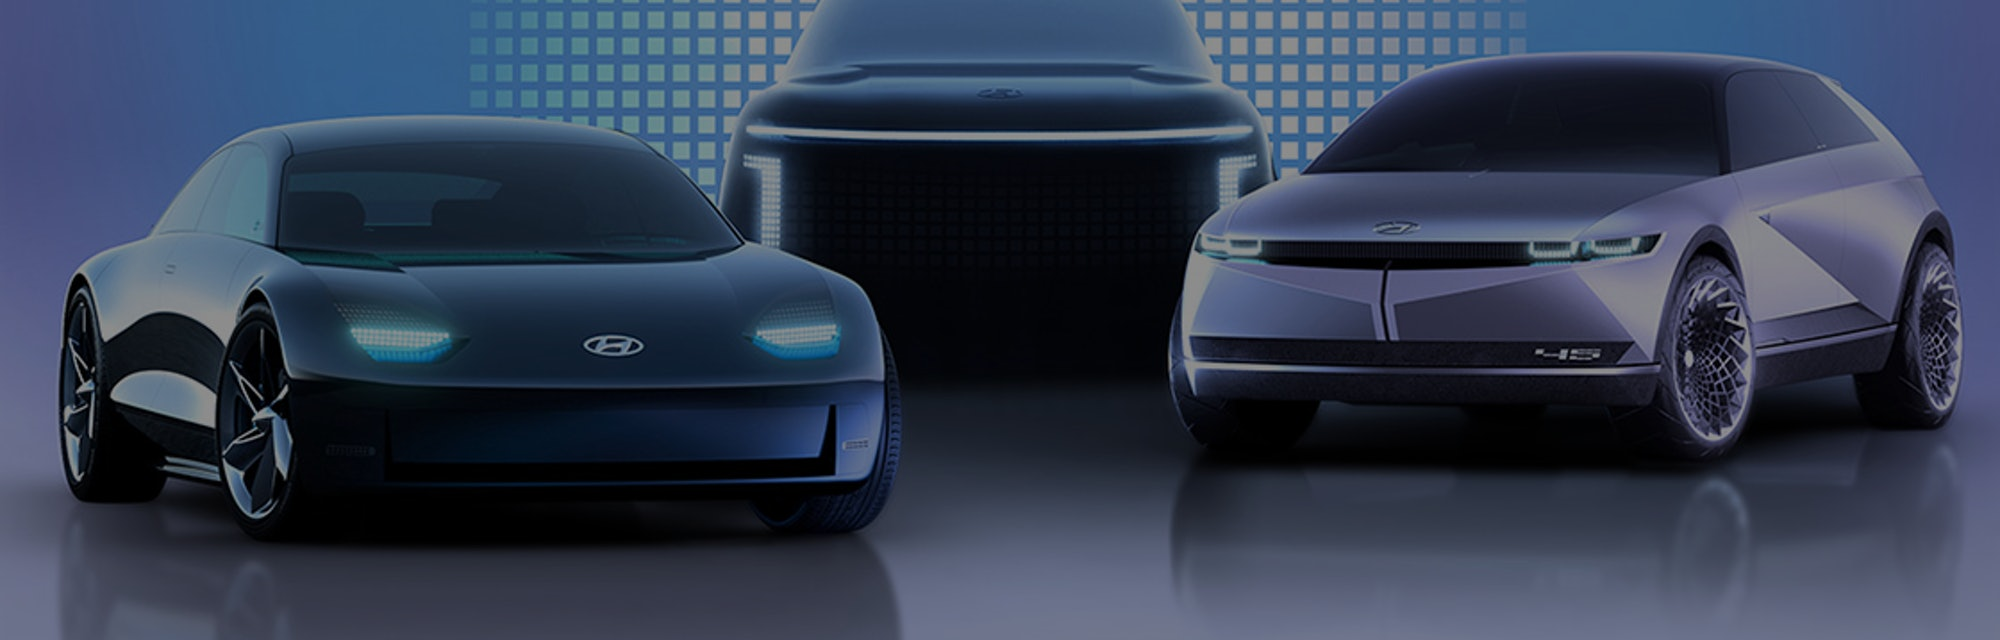 Hyundia's three forthcoming Ioniq electric vehicles.